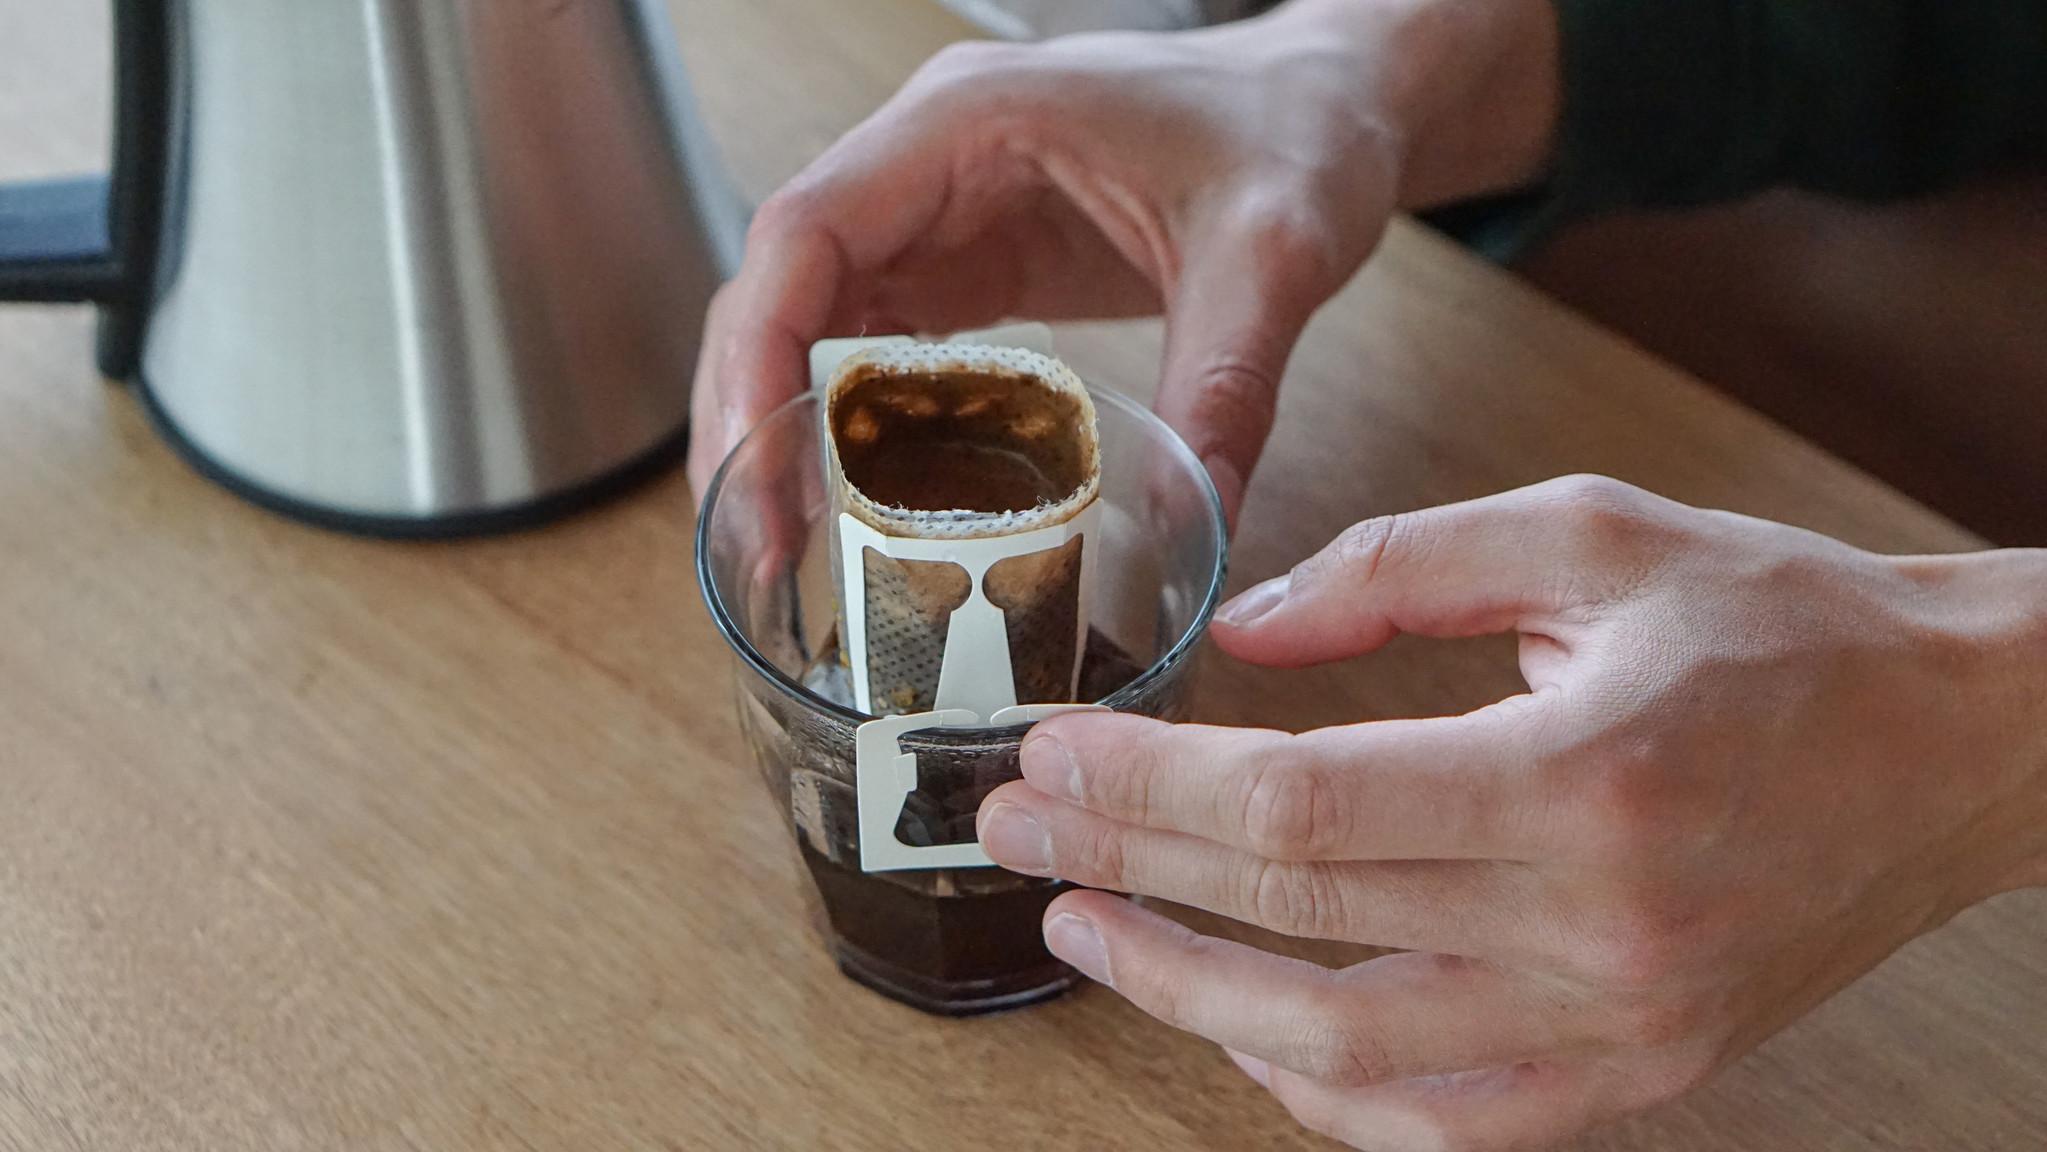 Making filter coffee